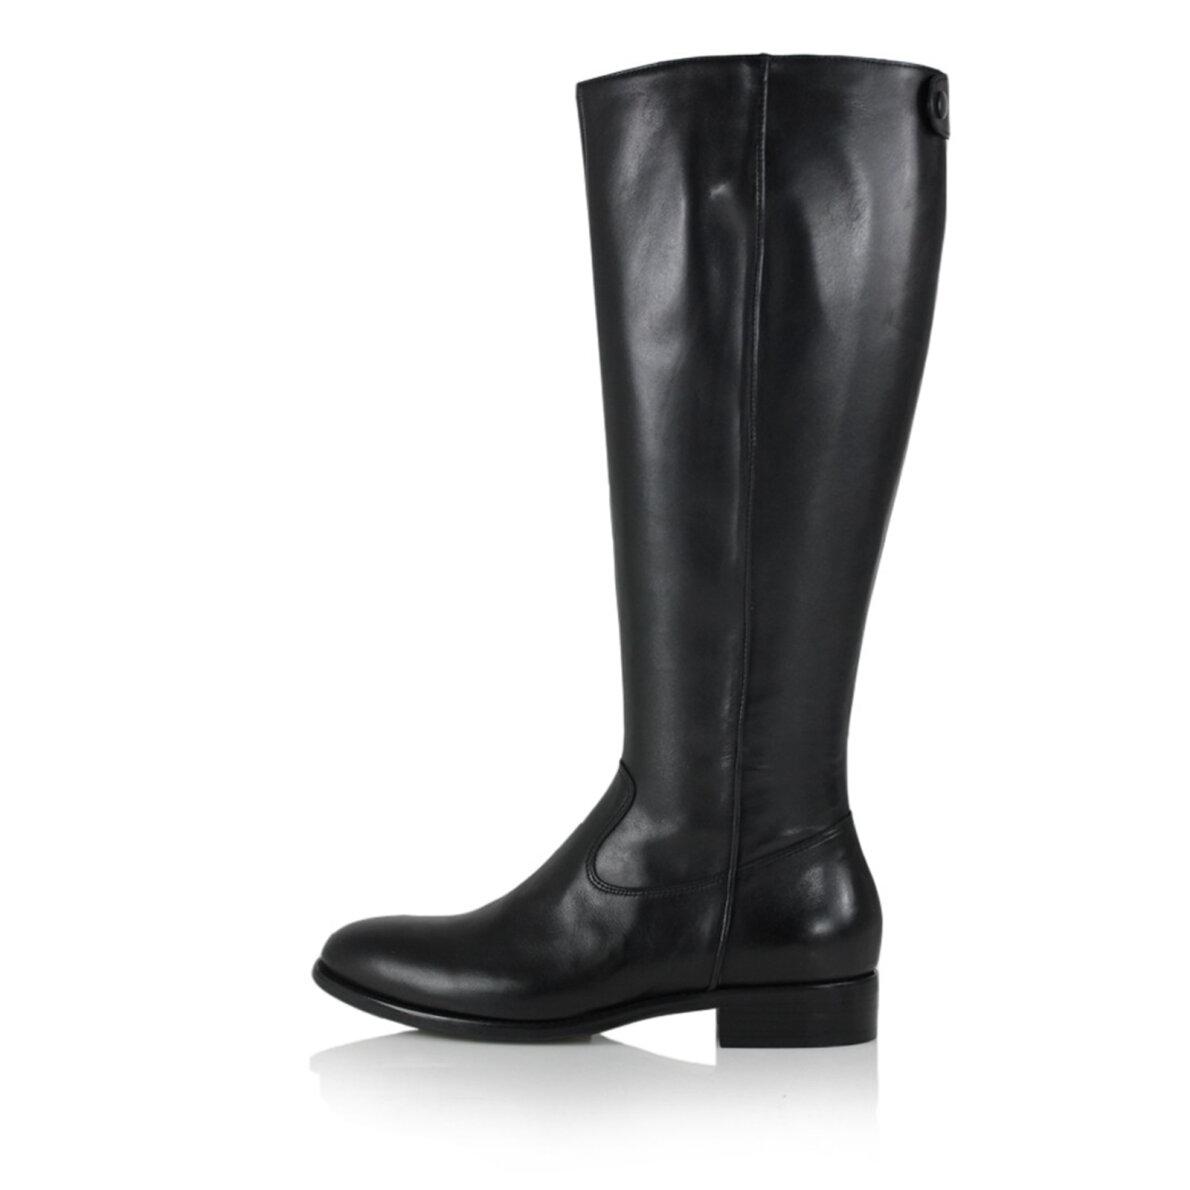 c8d7128f7051 Billi Bi - Billi Bi 1013 sort lang damestøvle i skind ...